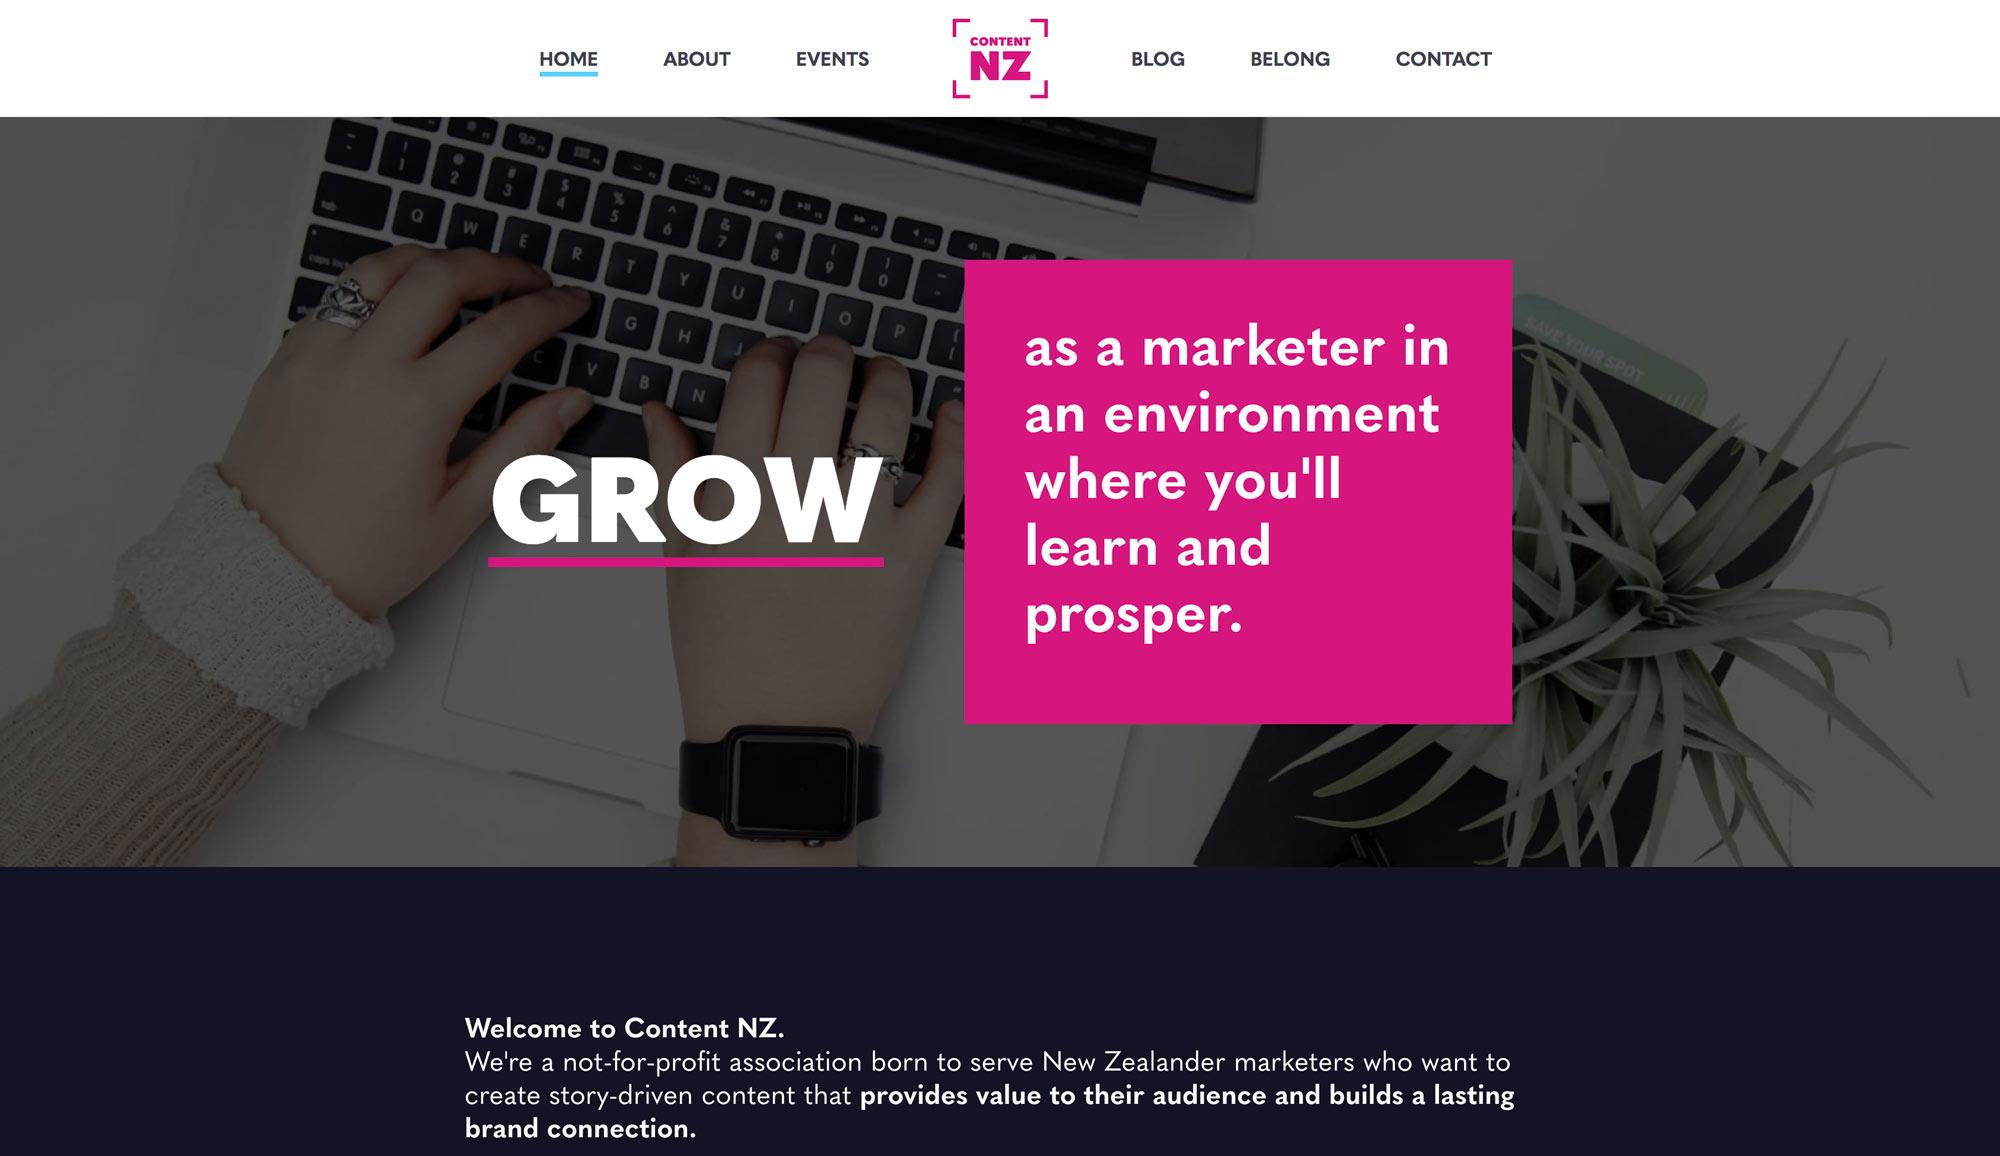 Content NZ - homepage design